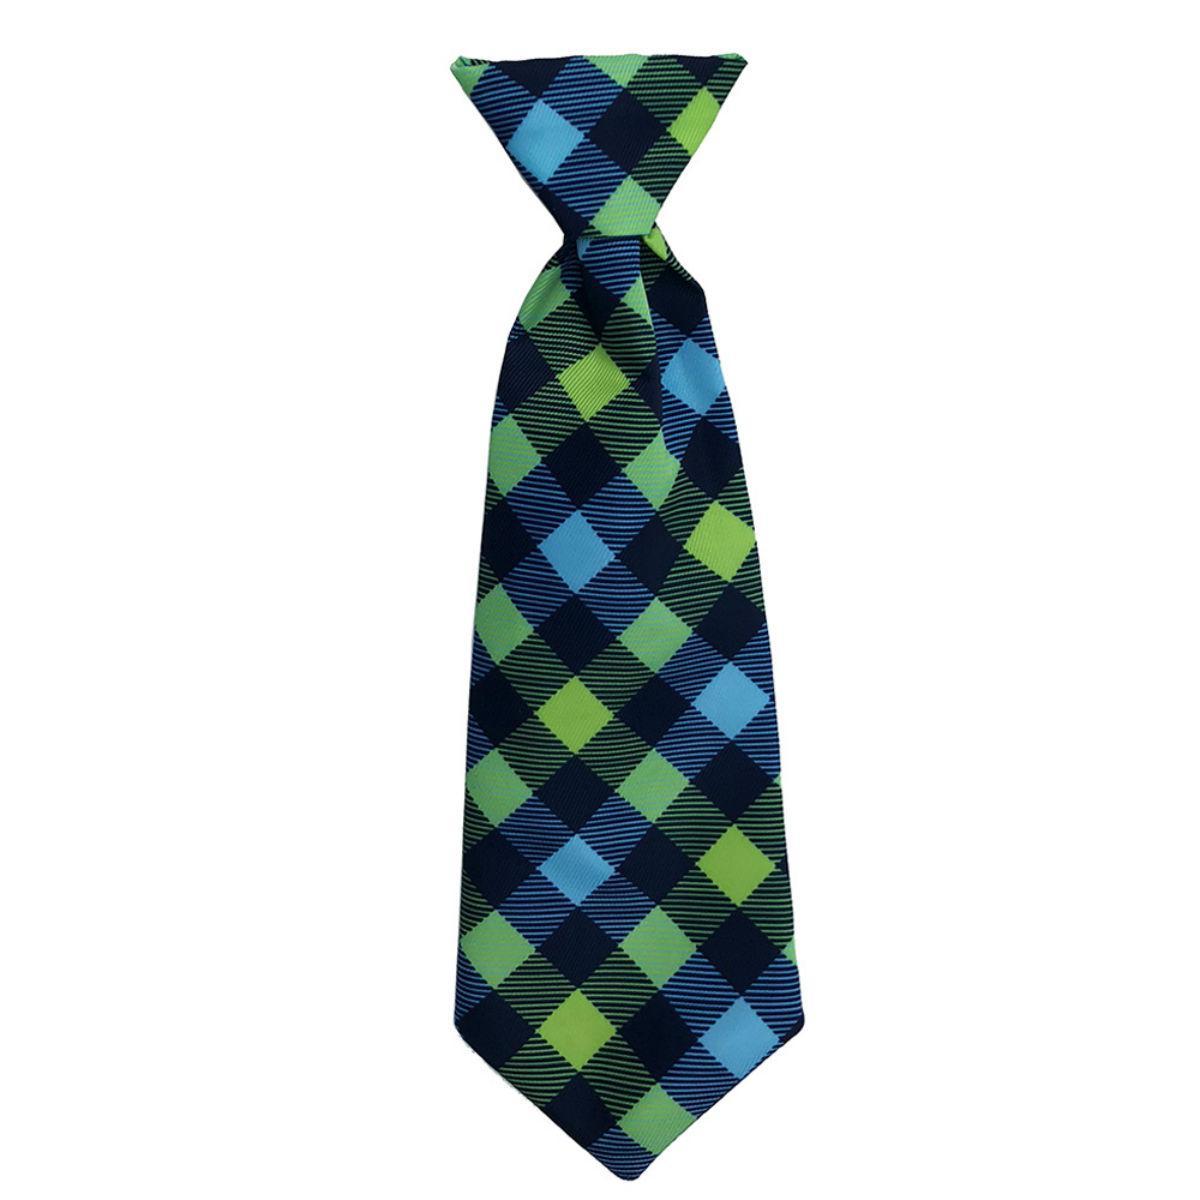 Huxley & Kent Long Tie Collar Attachment Dog Necktie - Navy Check